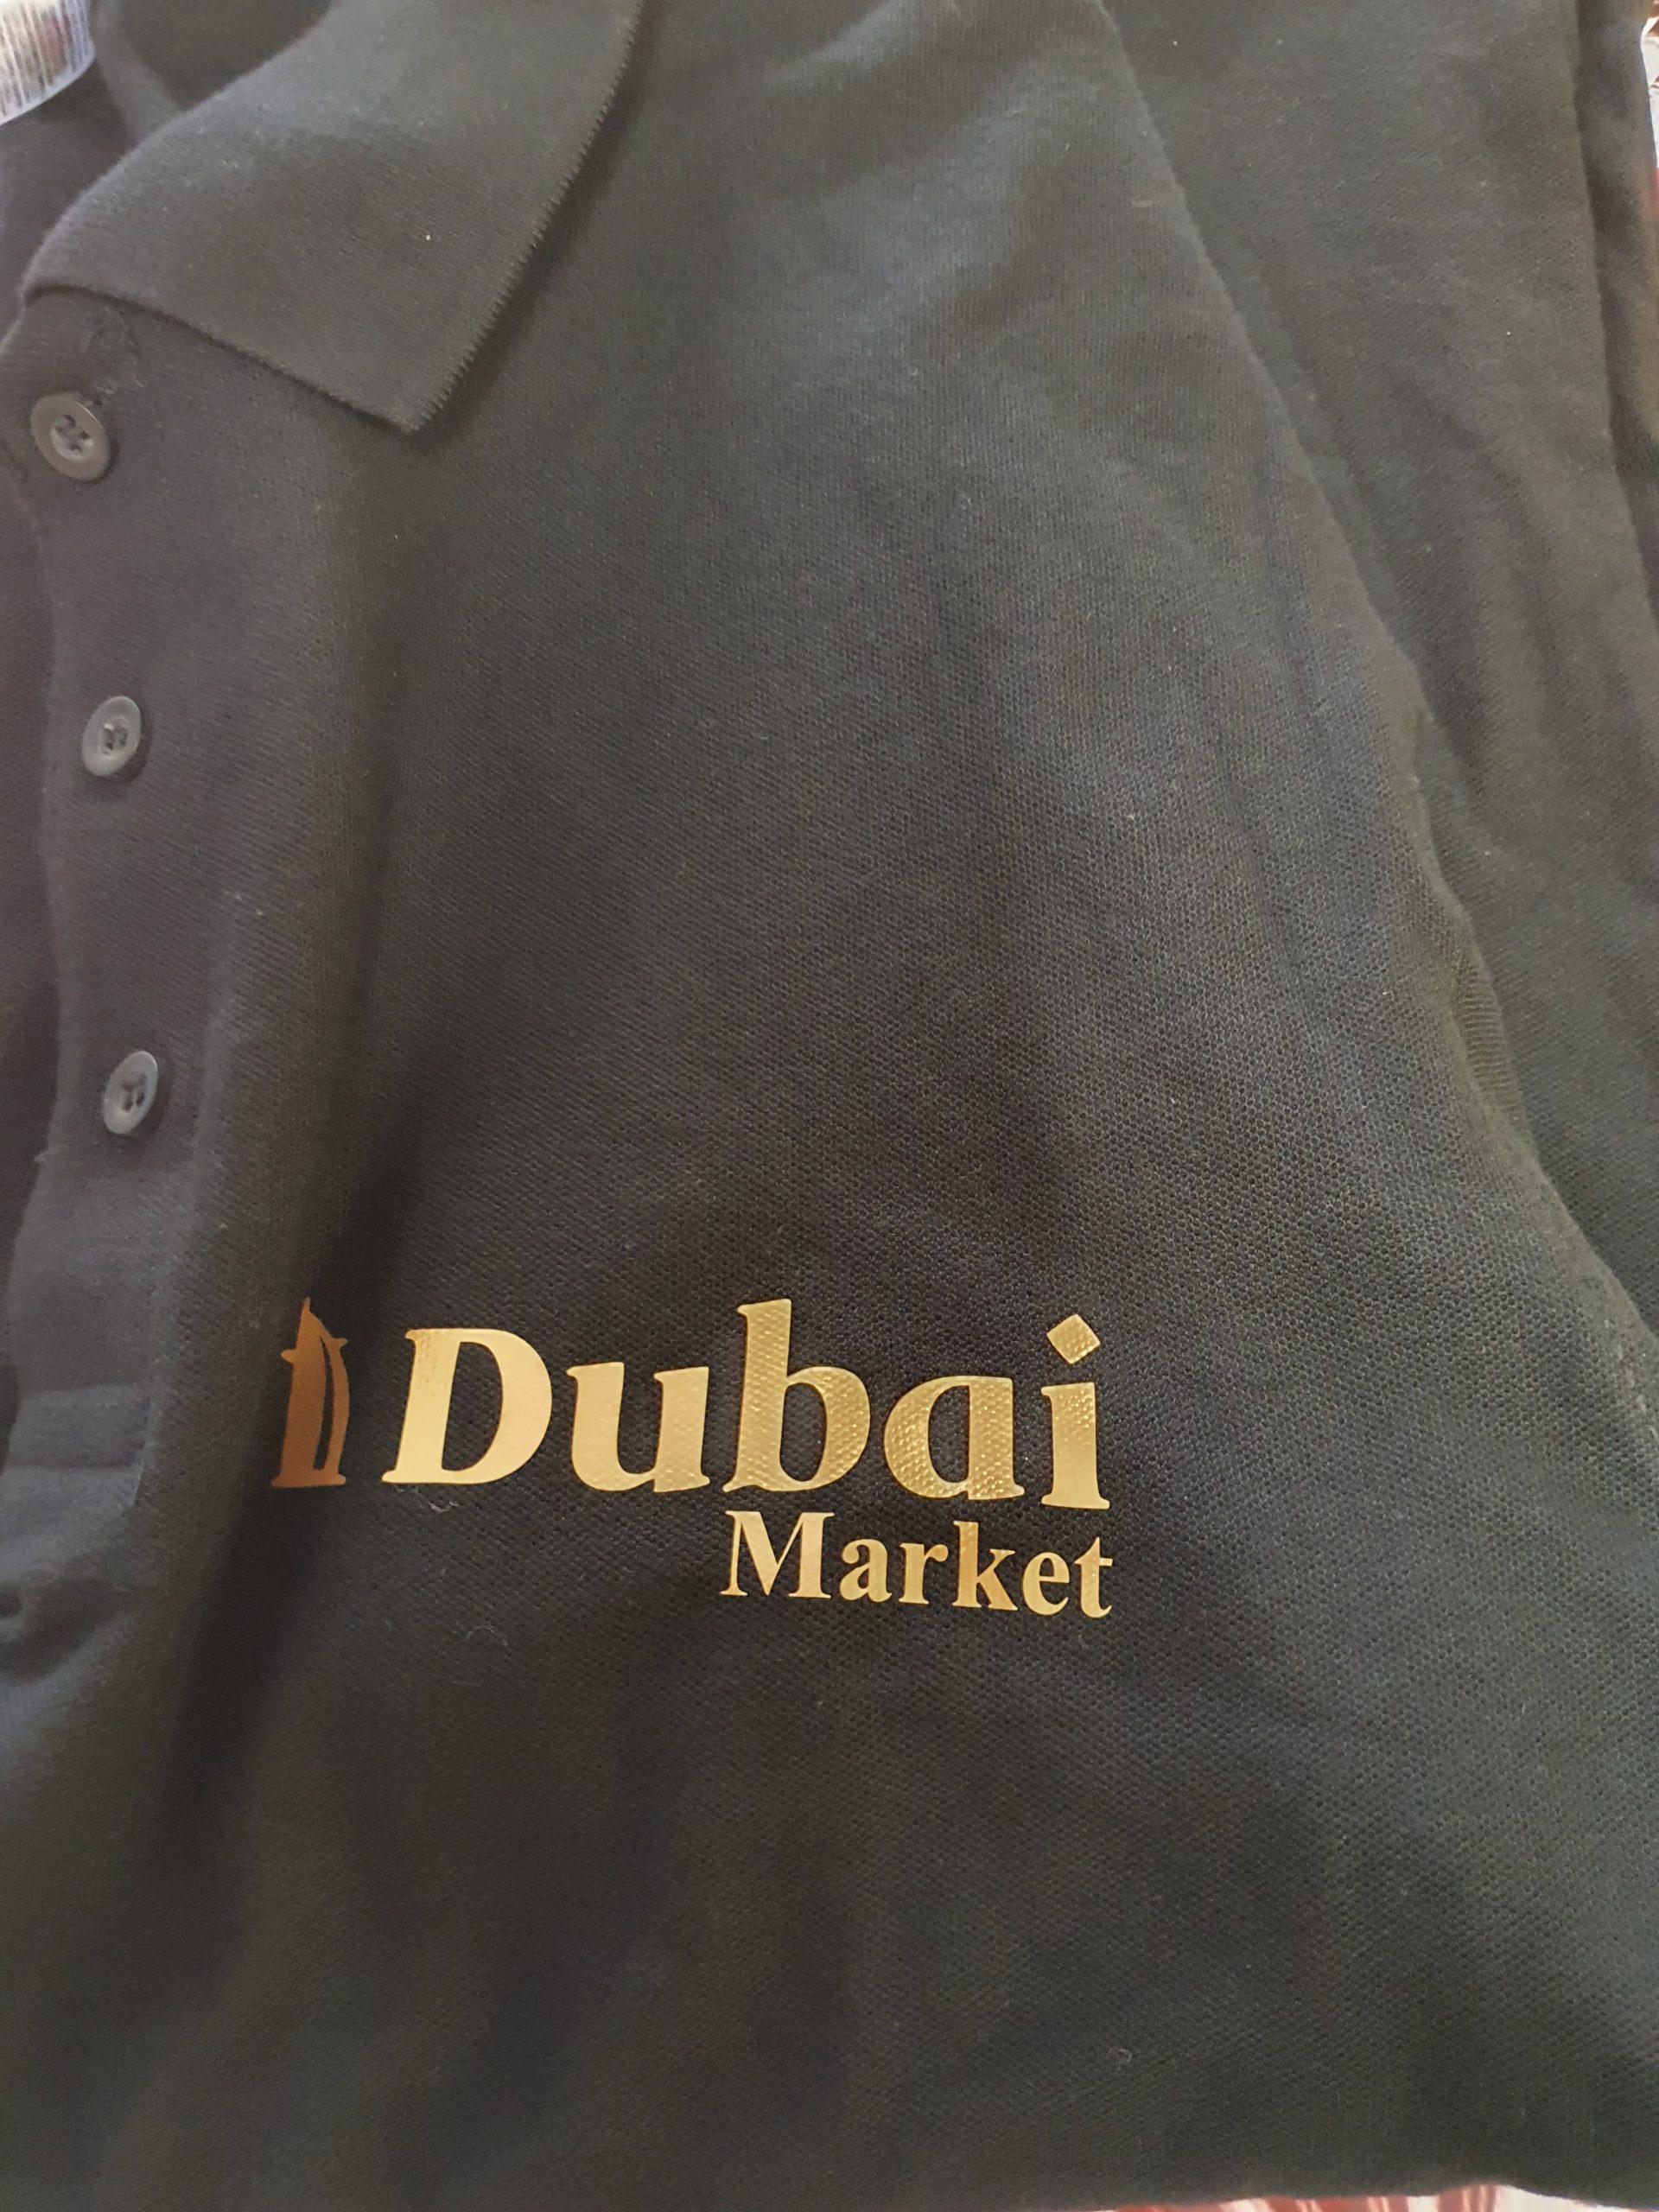 Dubai tee